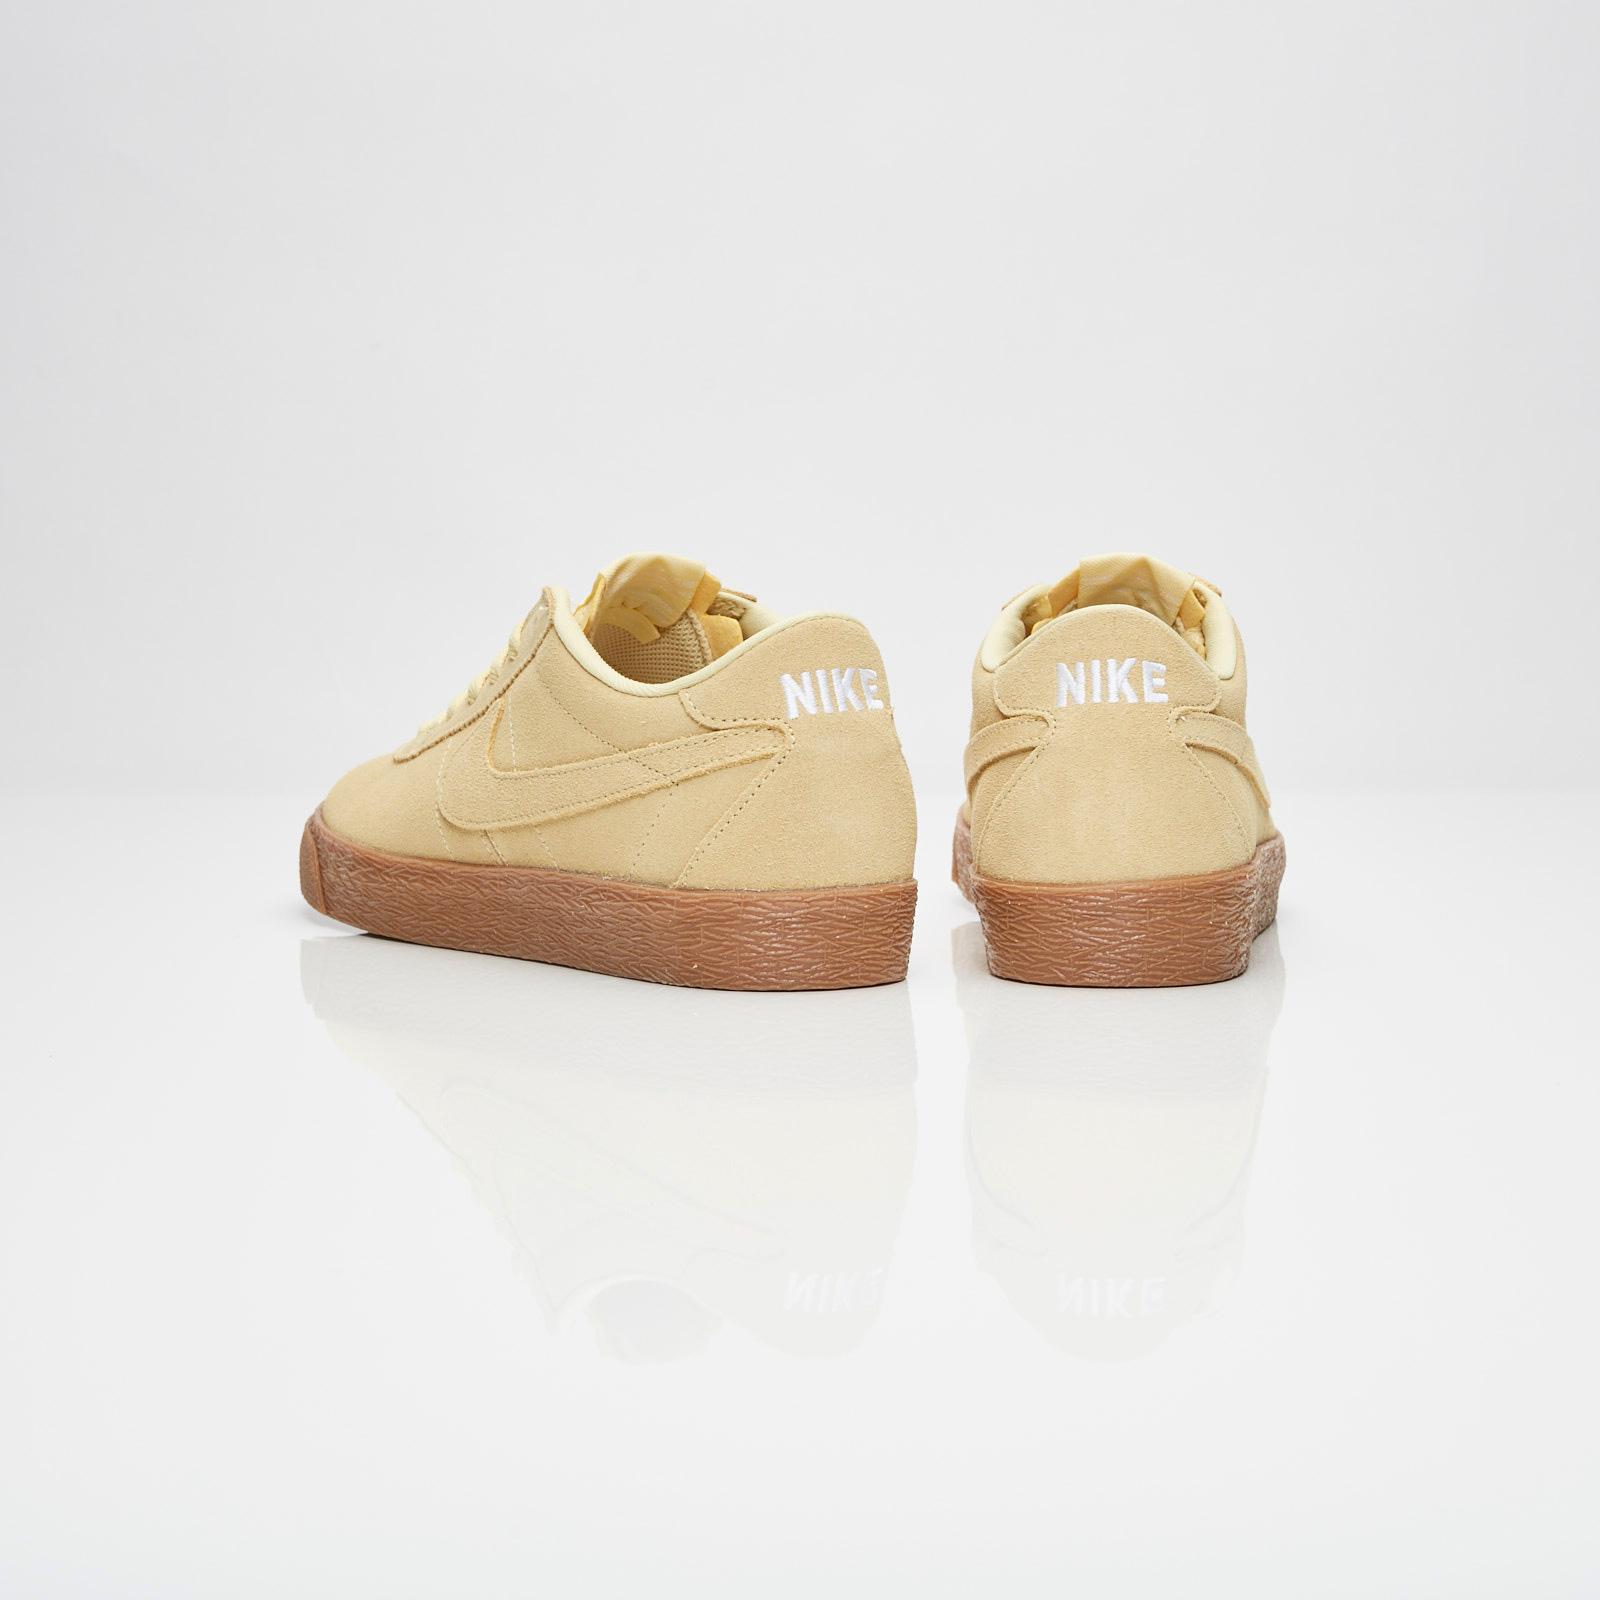 c120b22ab802 Nike Bruin Zoom PRM SE - 877045-700 - Sneakersnstuff